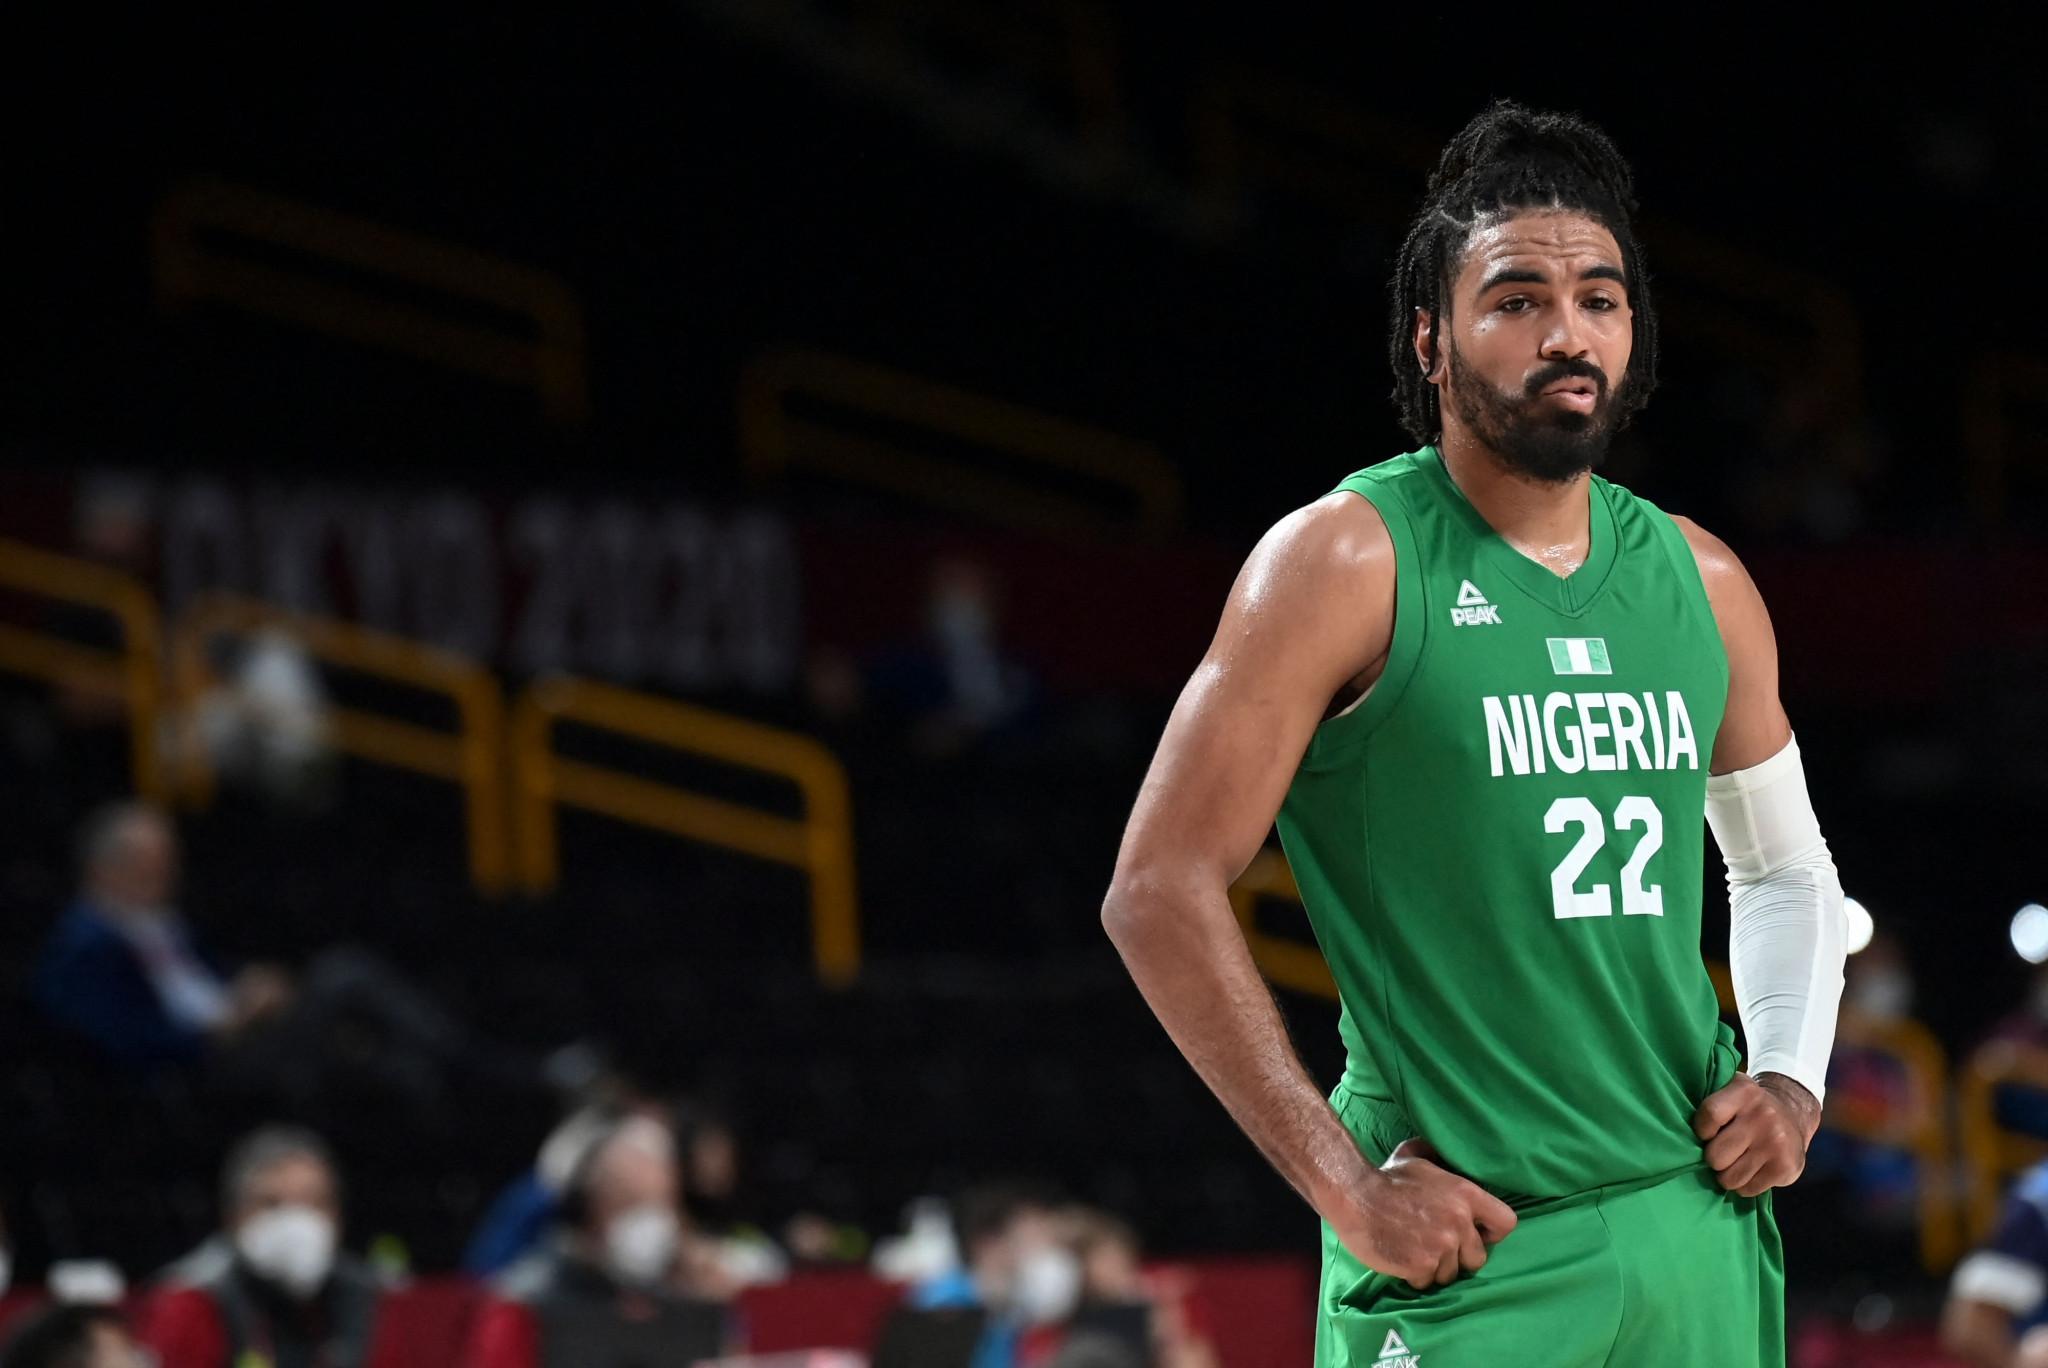 Nigeria Olympic Committee vehemently denies hampering basketball team's Olympic progress